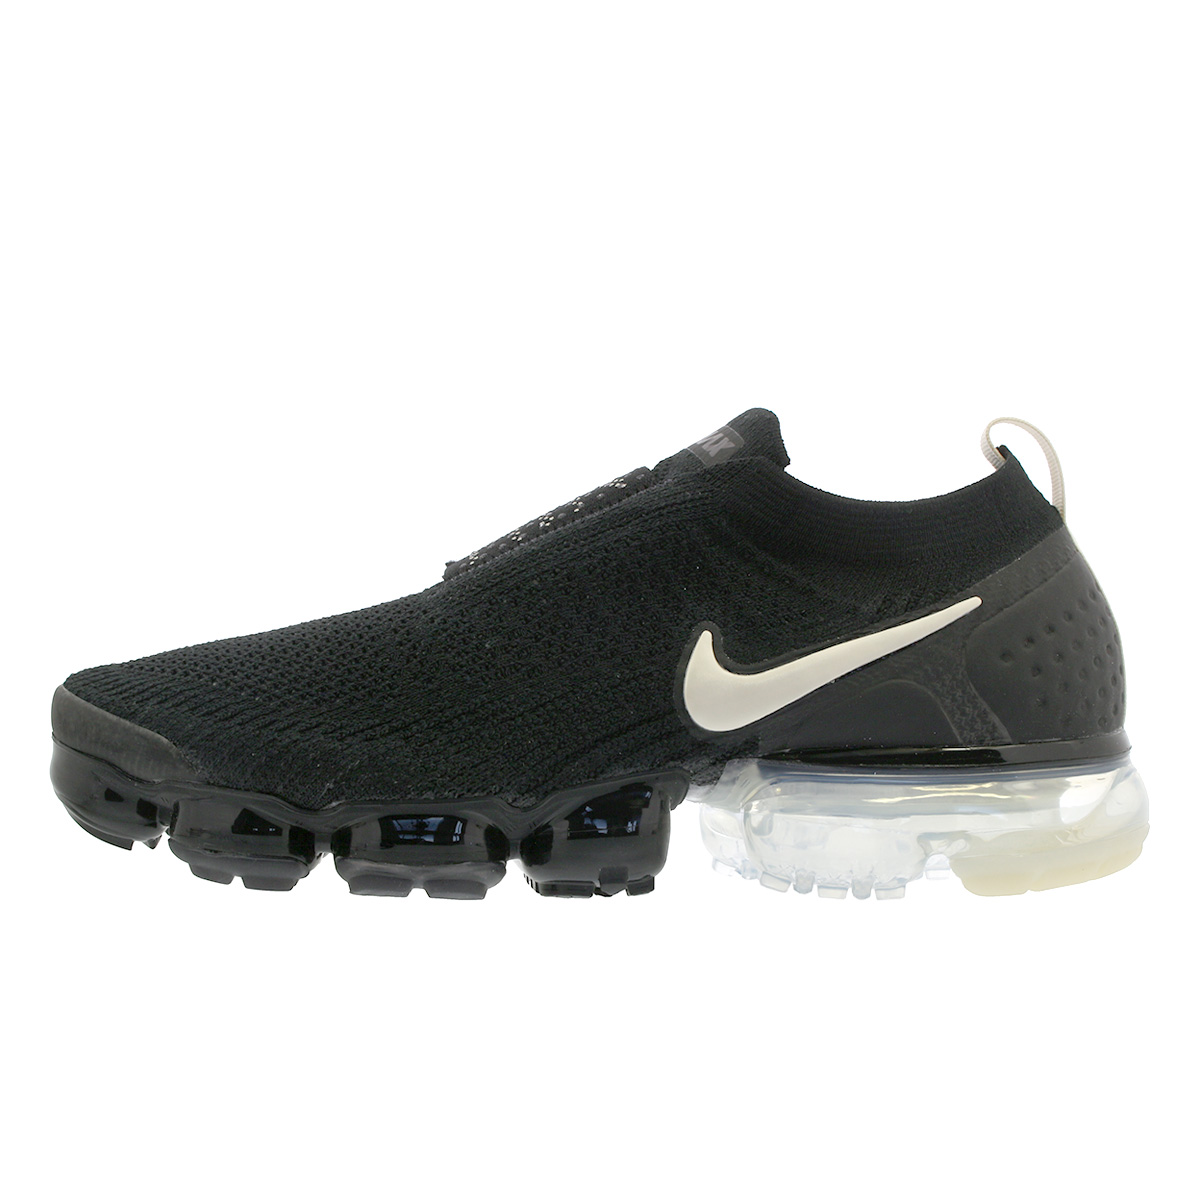 88362fd5277f NIKE AIR VAPORMAX MOC 2 Nike air vapor max fried food knit mock 2 BLACK LIGHT  CREAM WHITE THUNDER GREY ah7006-002